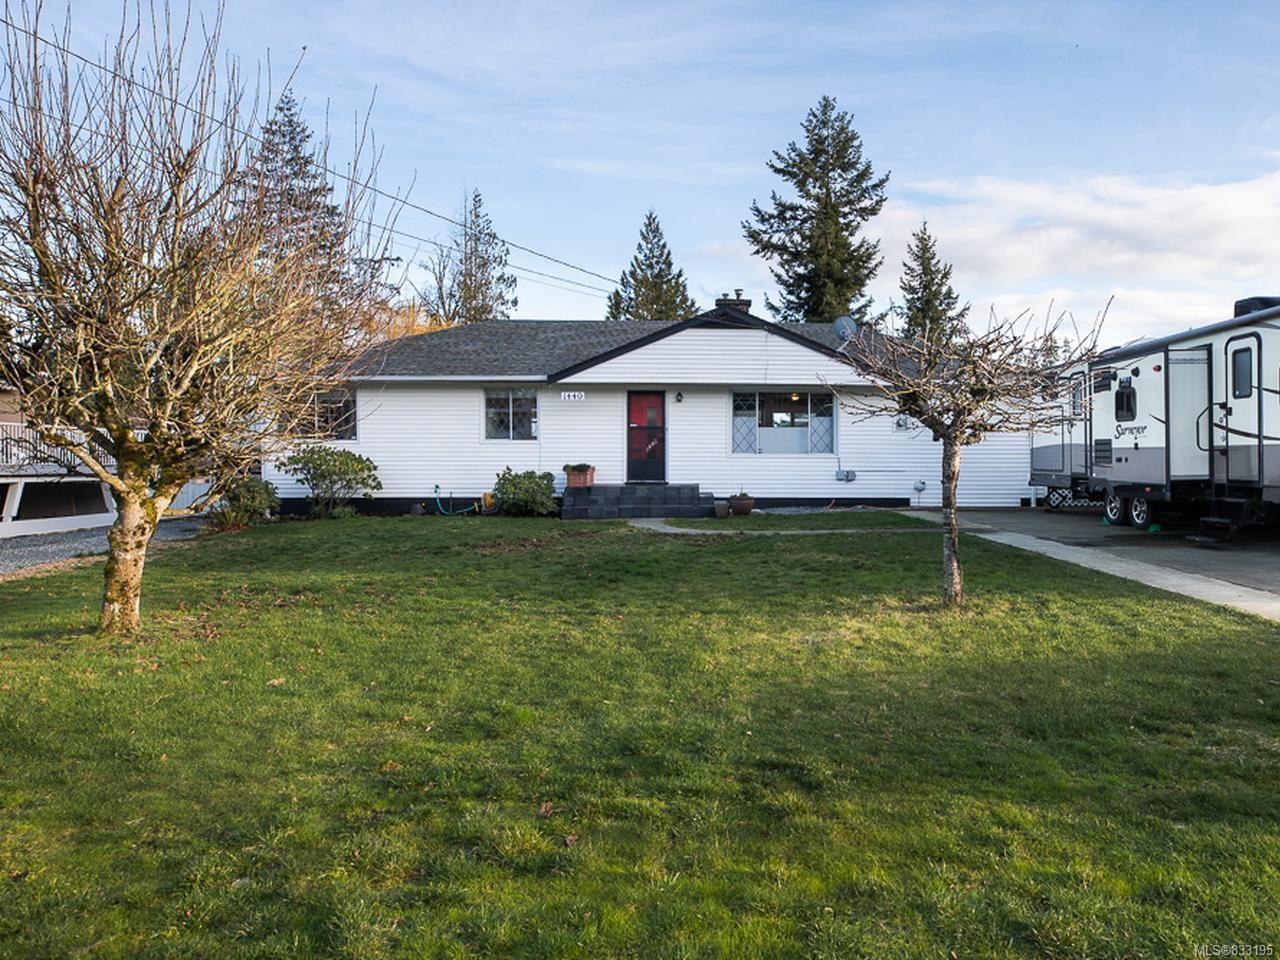 Main Photo: 1440 Windsor Ave in NANAIMO: Na Departure Bay House for sale (Nanaimo)  : MLS®# 833195